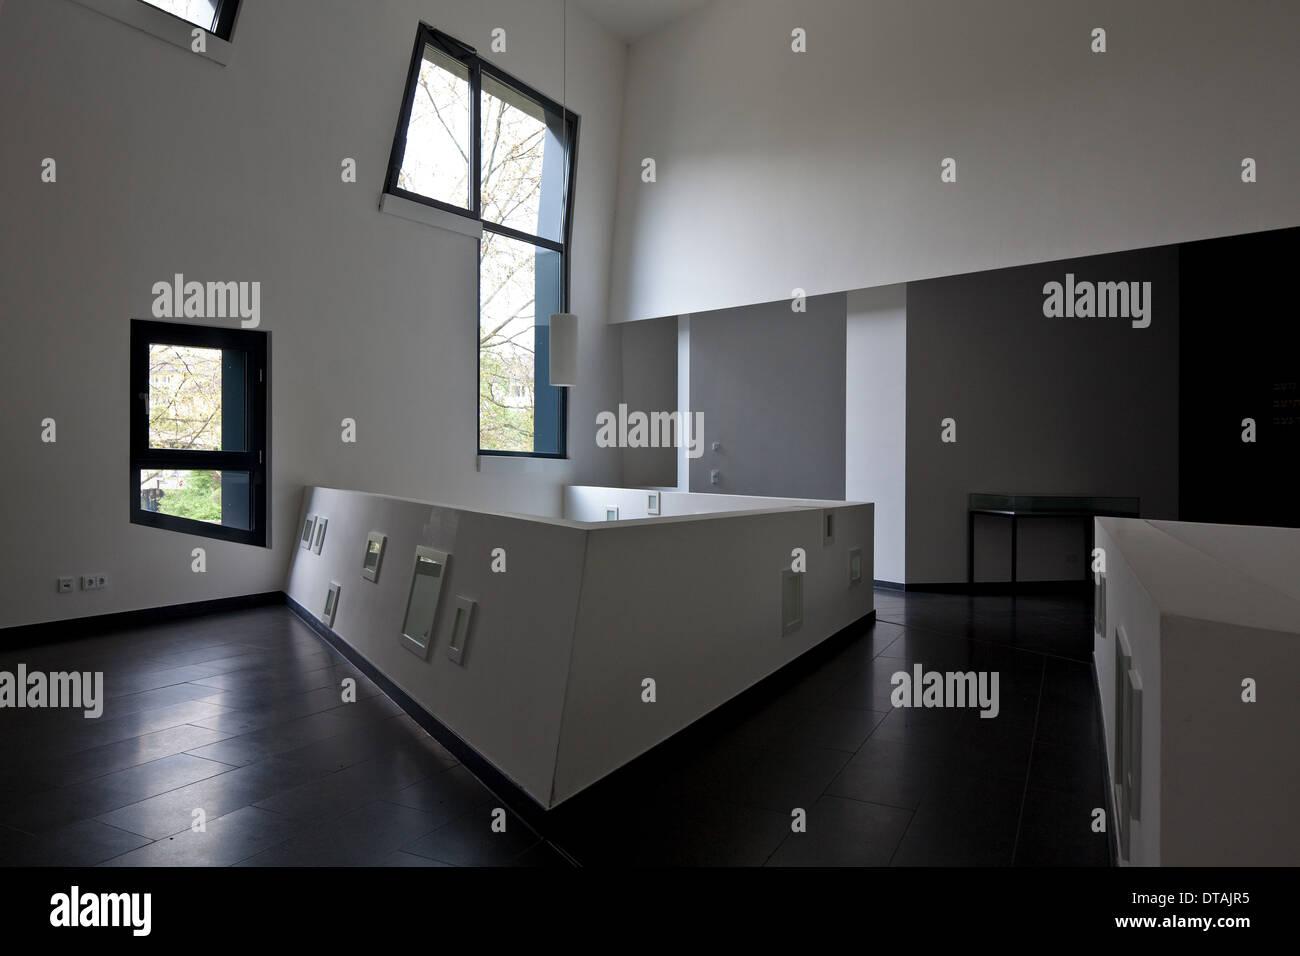 Mainz, Neue Synagoge - Stock Image